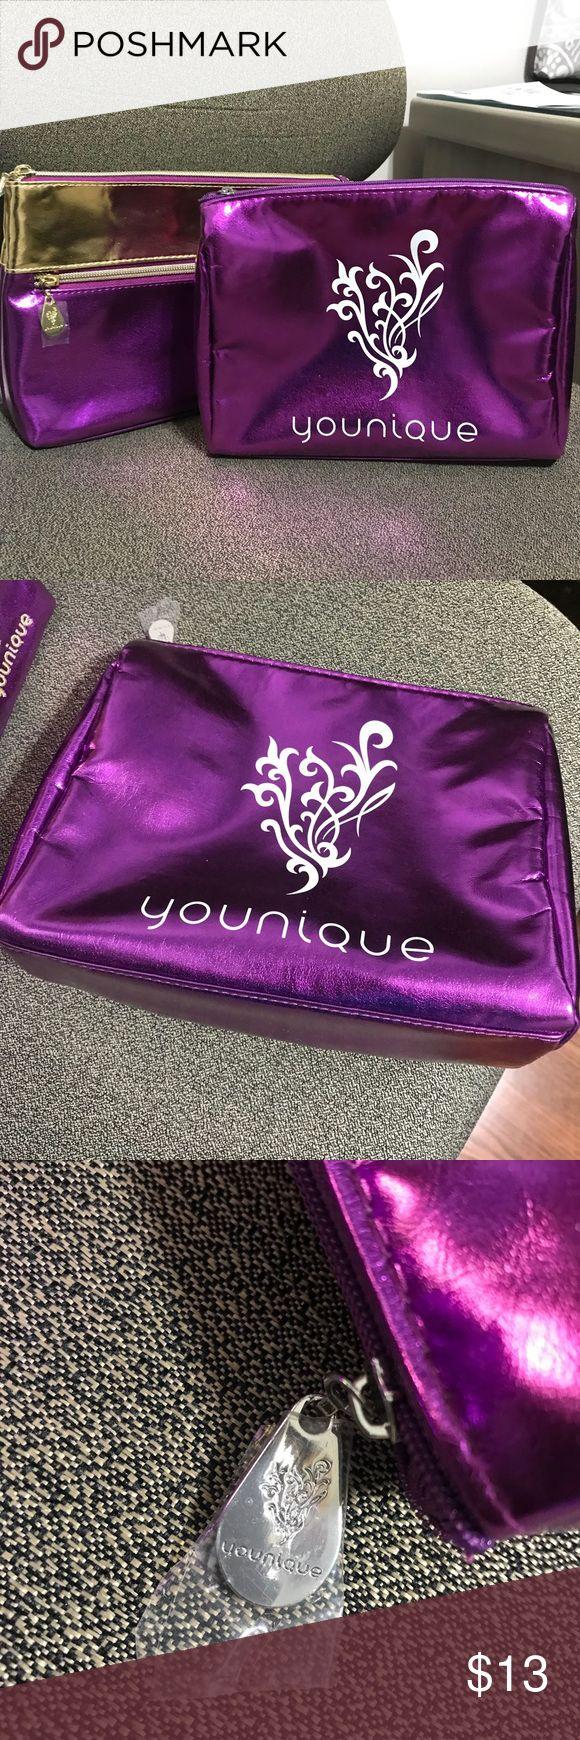 2 Younique makeup cosmetics bag Royalty color Makeup